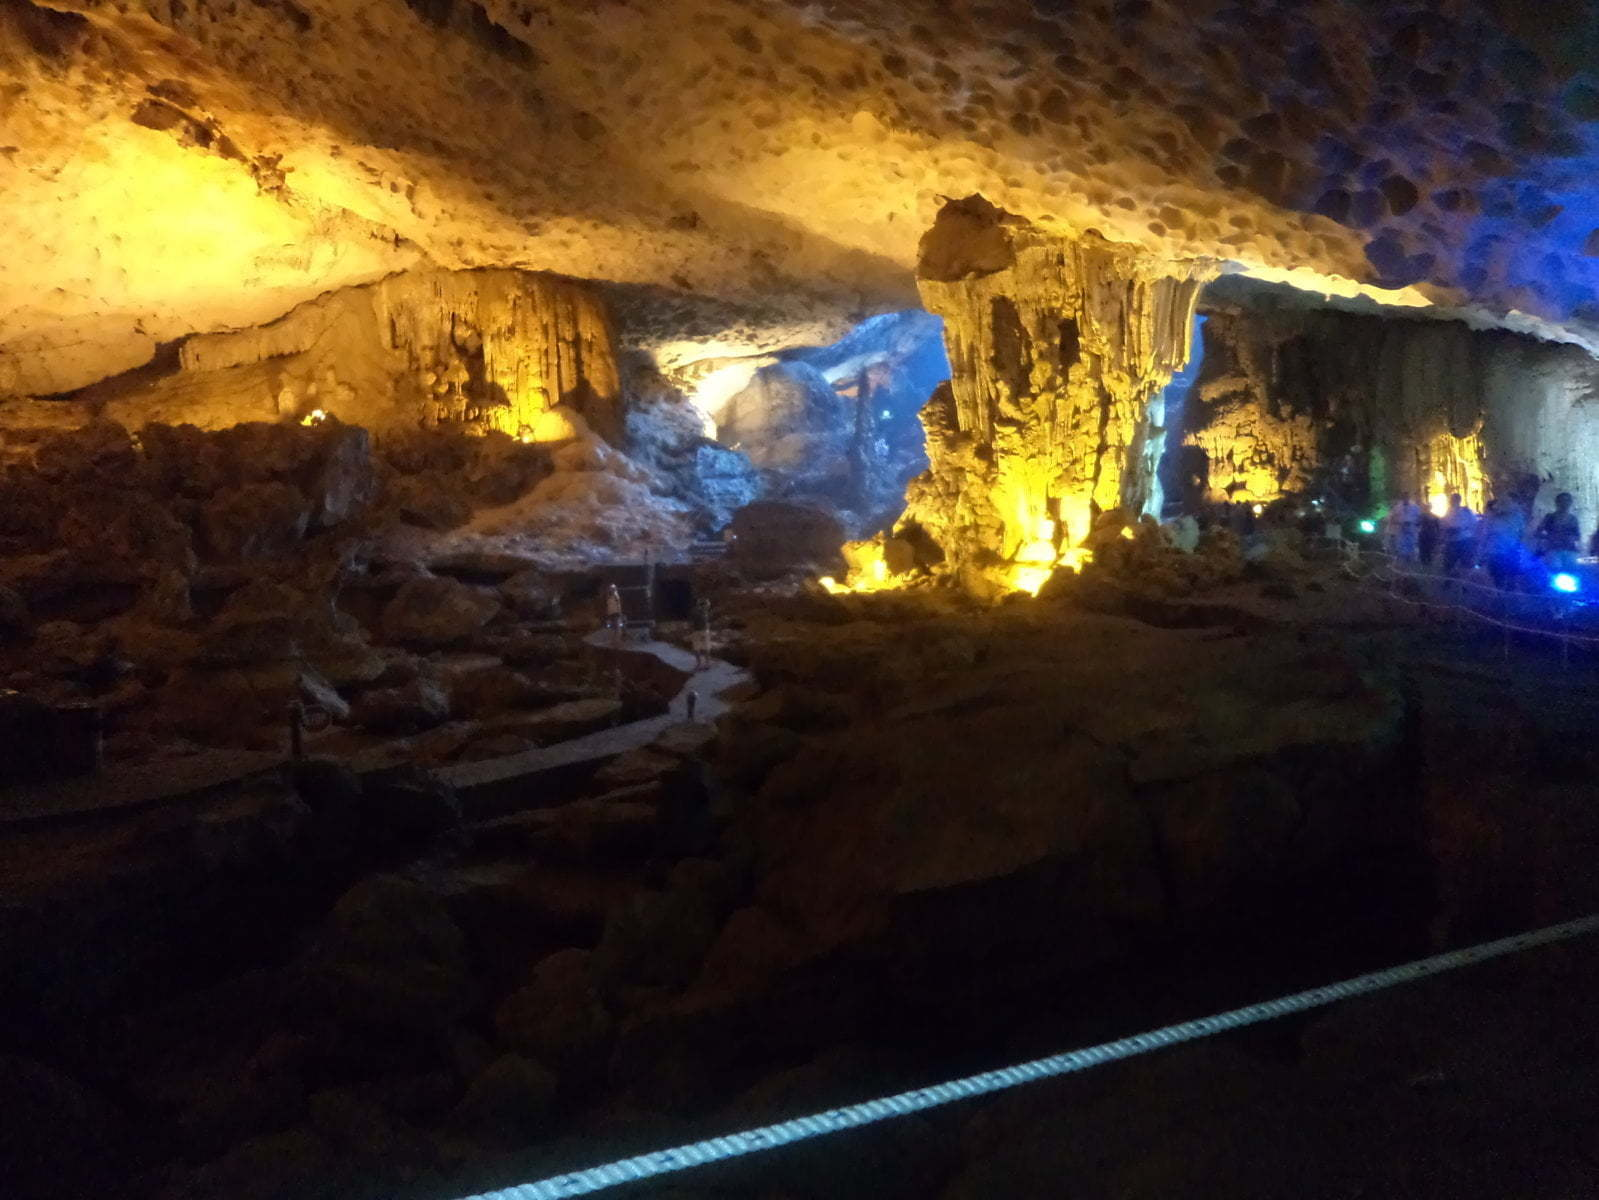 Interior da Luan Cave - Ha Long Bay, próximo a Hanoi, Vietnã